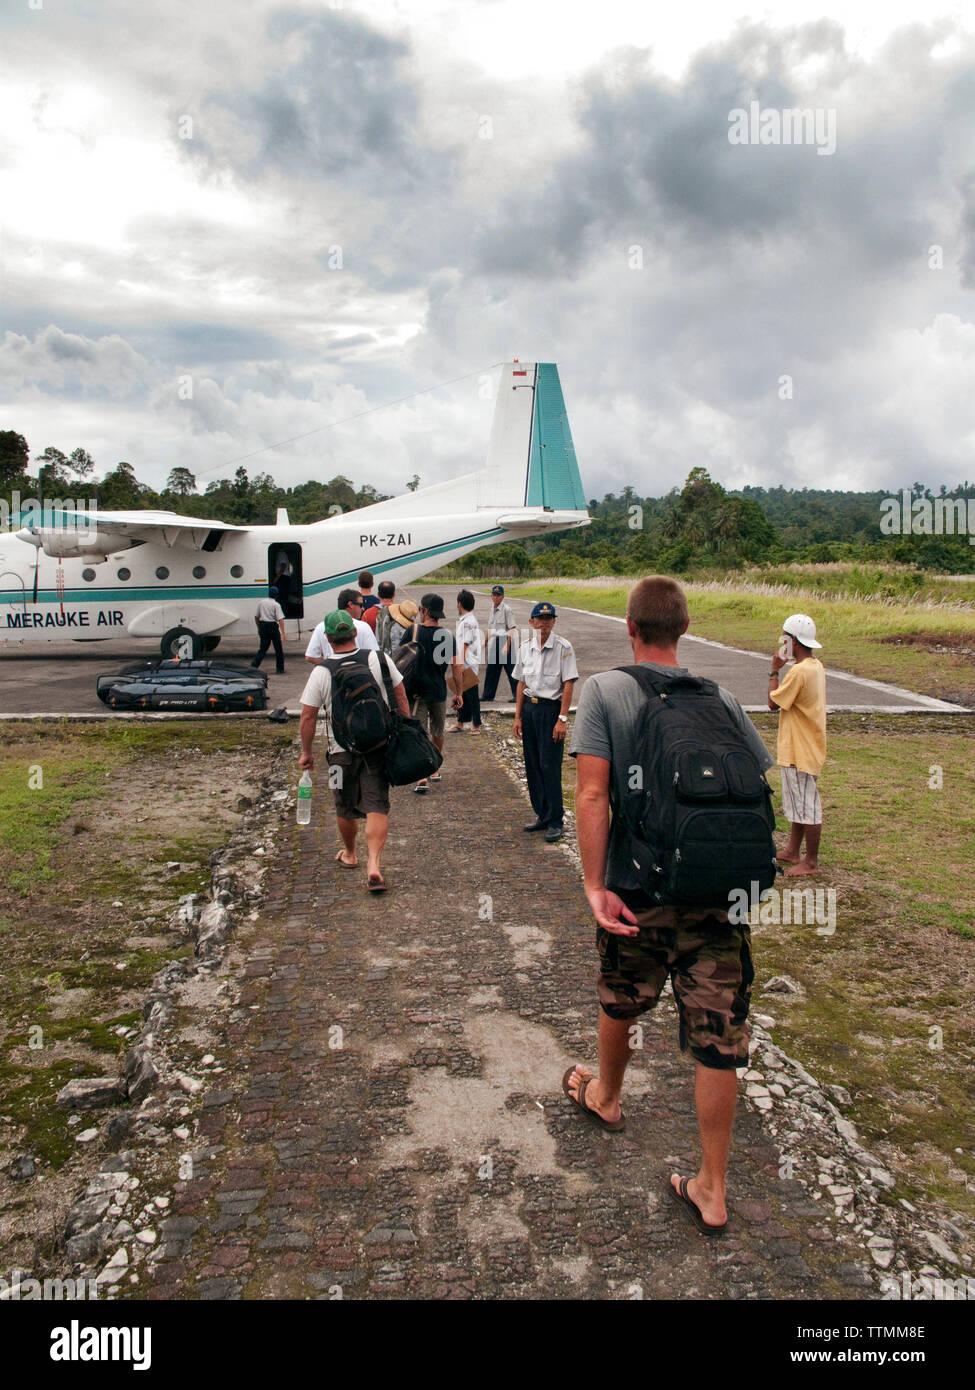 INDONESIA, Mentawai Islands, surfers leaving Sipora island for Padang - Stock Image